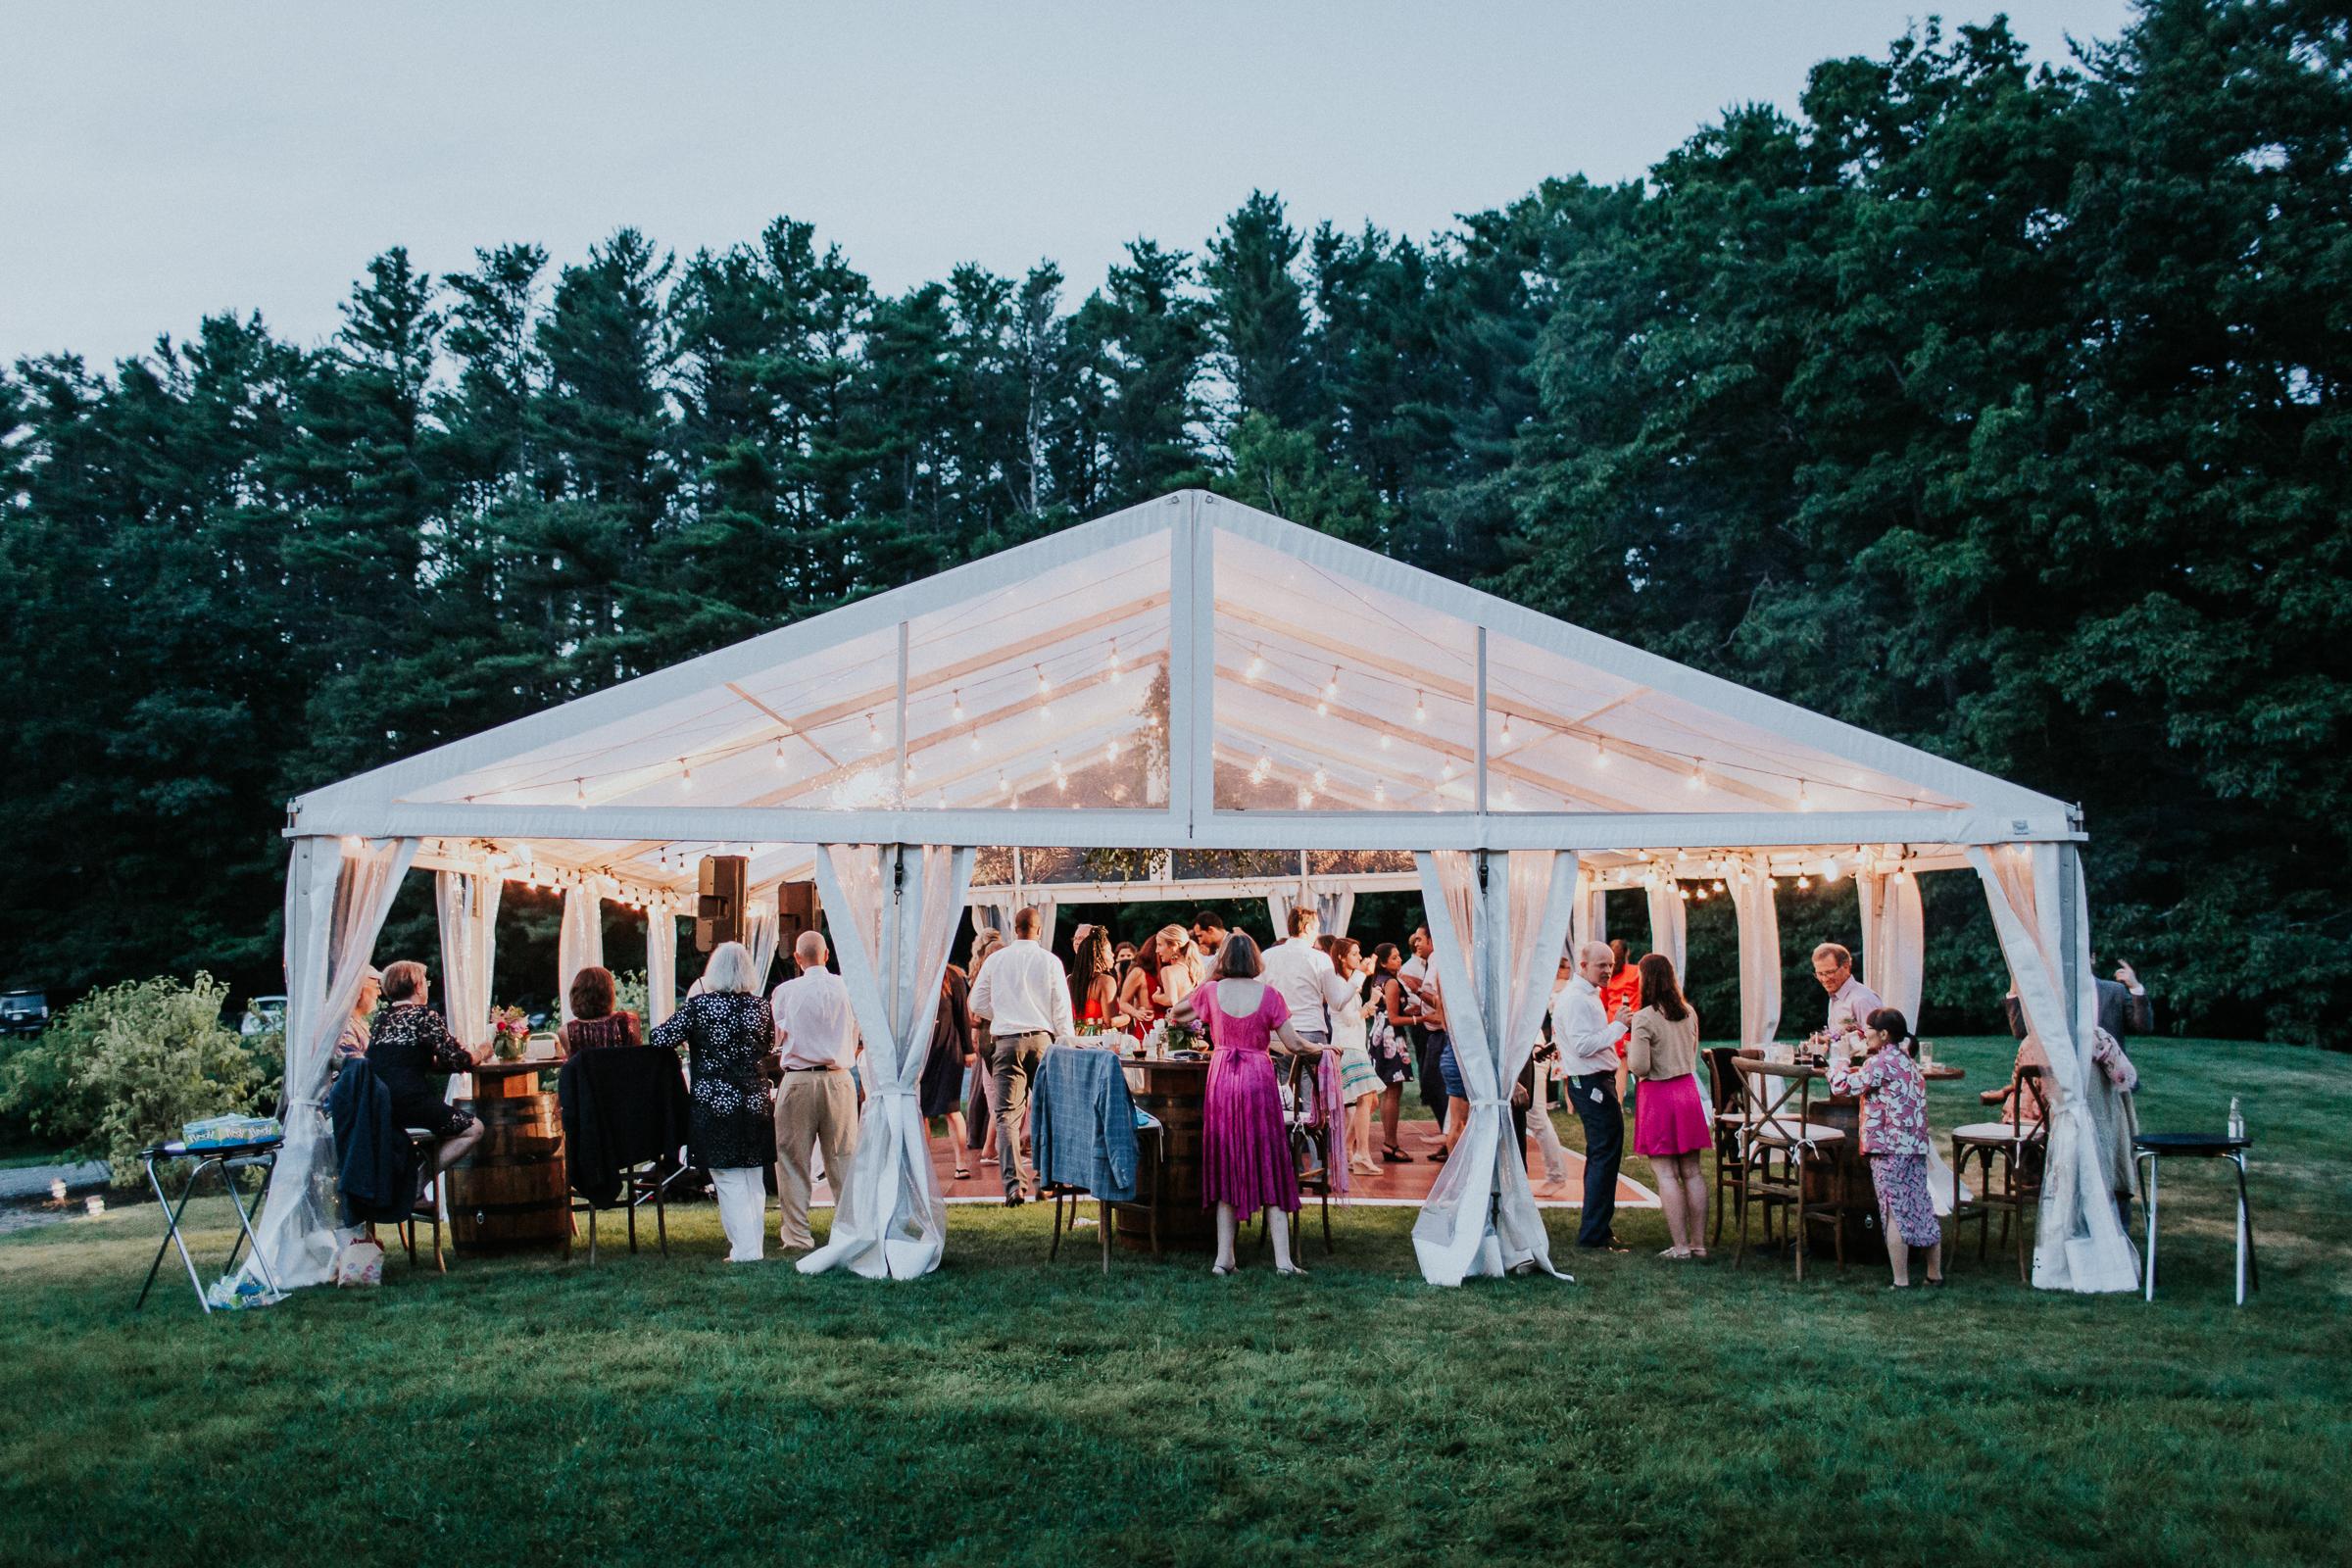 Marianmade-Farm-Wiscasset-Maine-Fine-Art-Documentary-Wedding-Photographer-Elvira-Kalviste-Photography-157.jpg